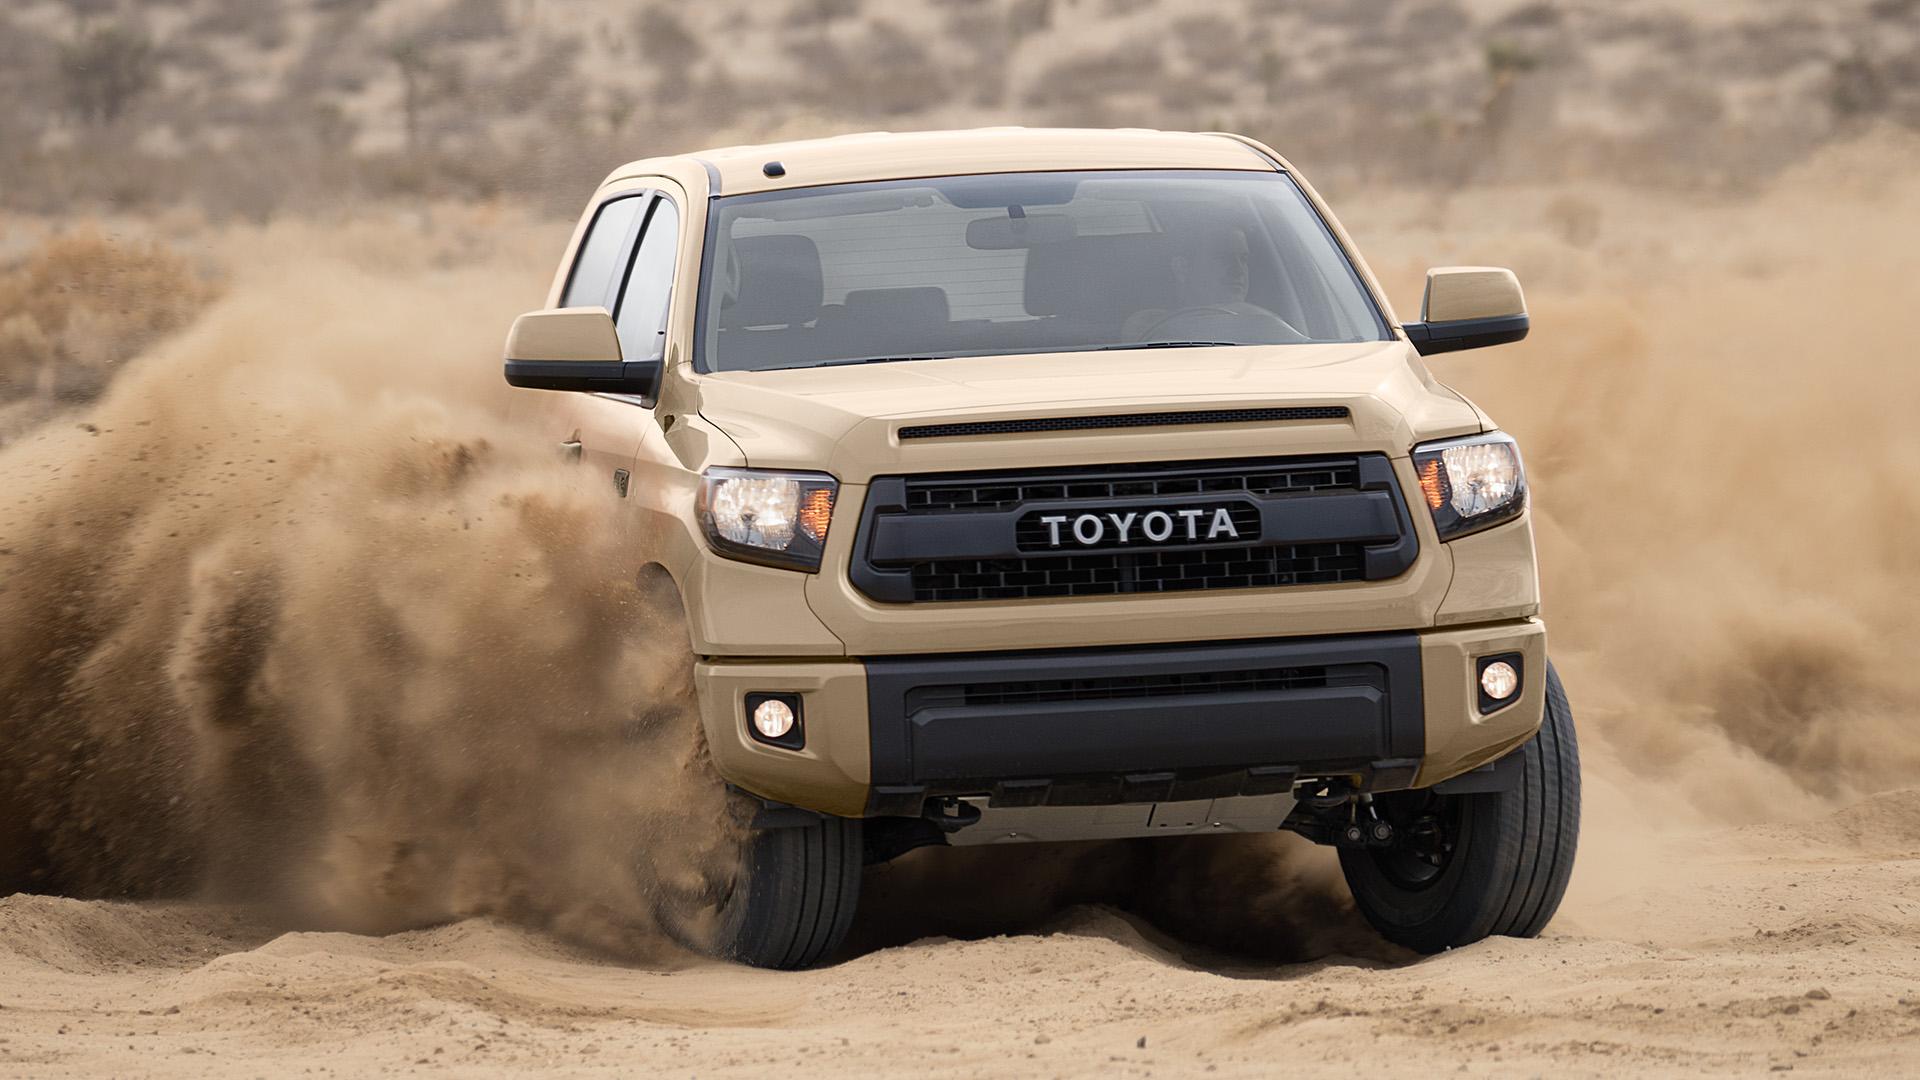 2016 Toyota Tundra Diesel Mpg >> One Truck Tug-of-War: 2016 Ram 1500 vs. 2016 Toyota Tundra